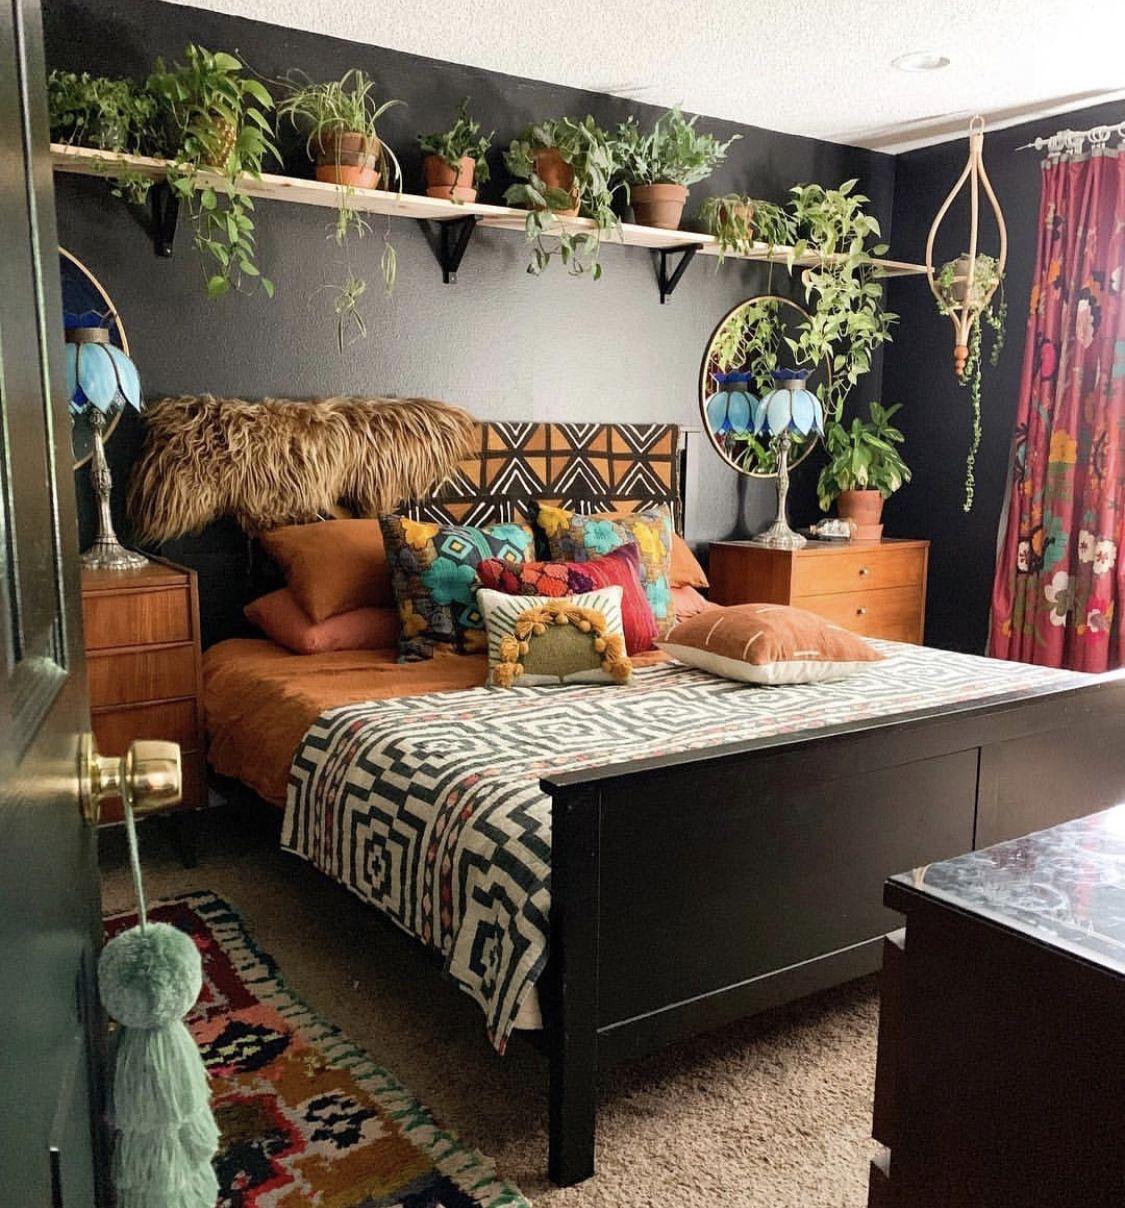 Plants on shelf above bed | Hippie home decor, Bohemian ...